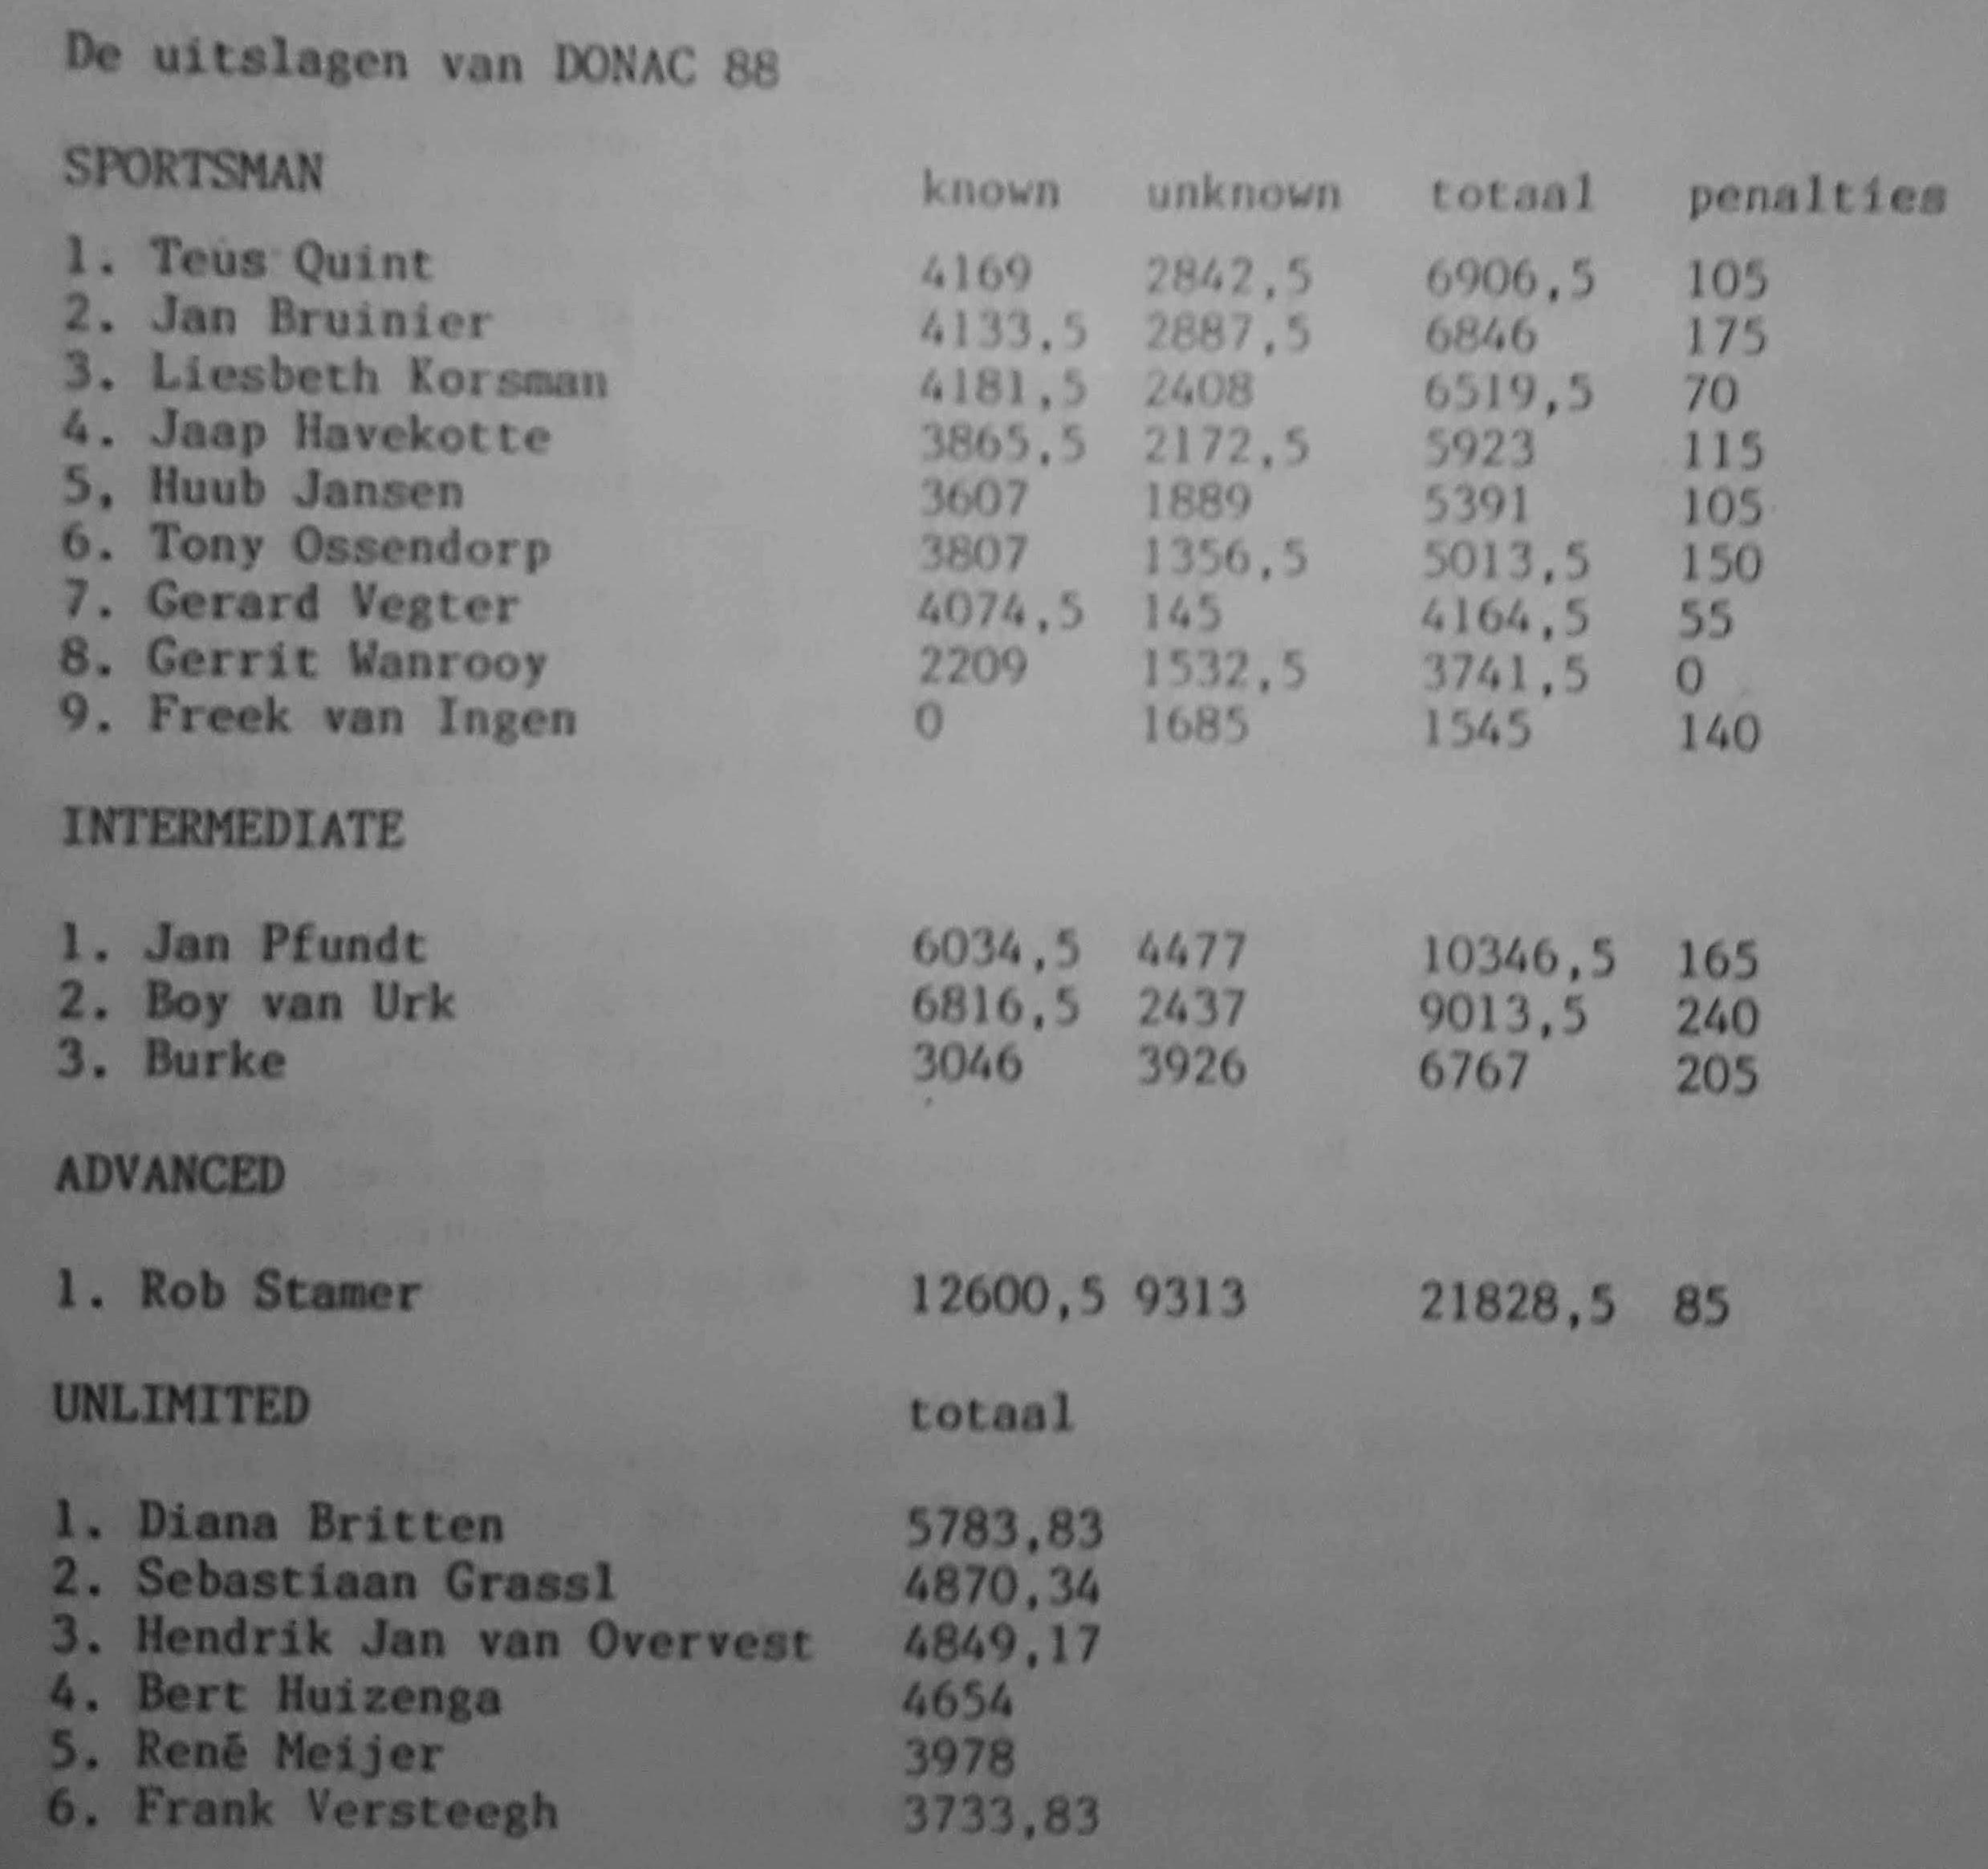 DONAC 1988 results